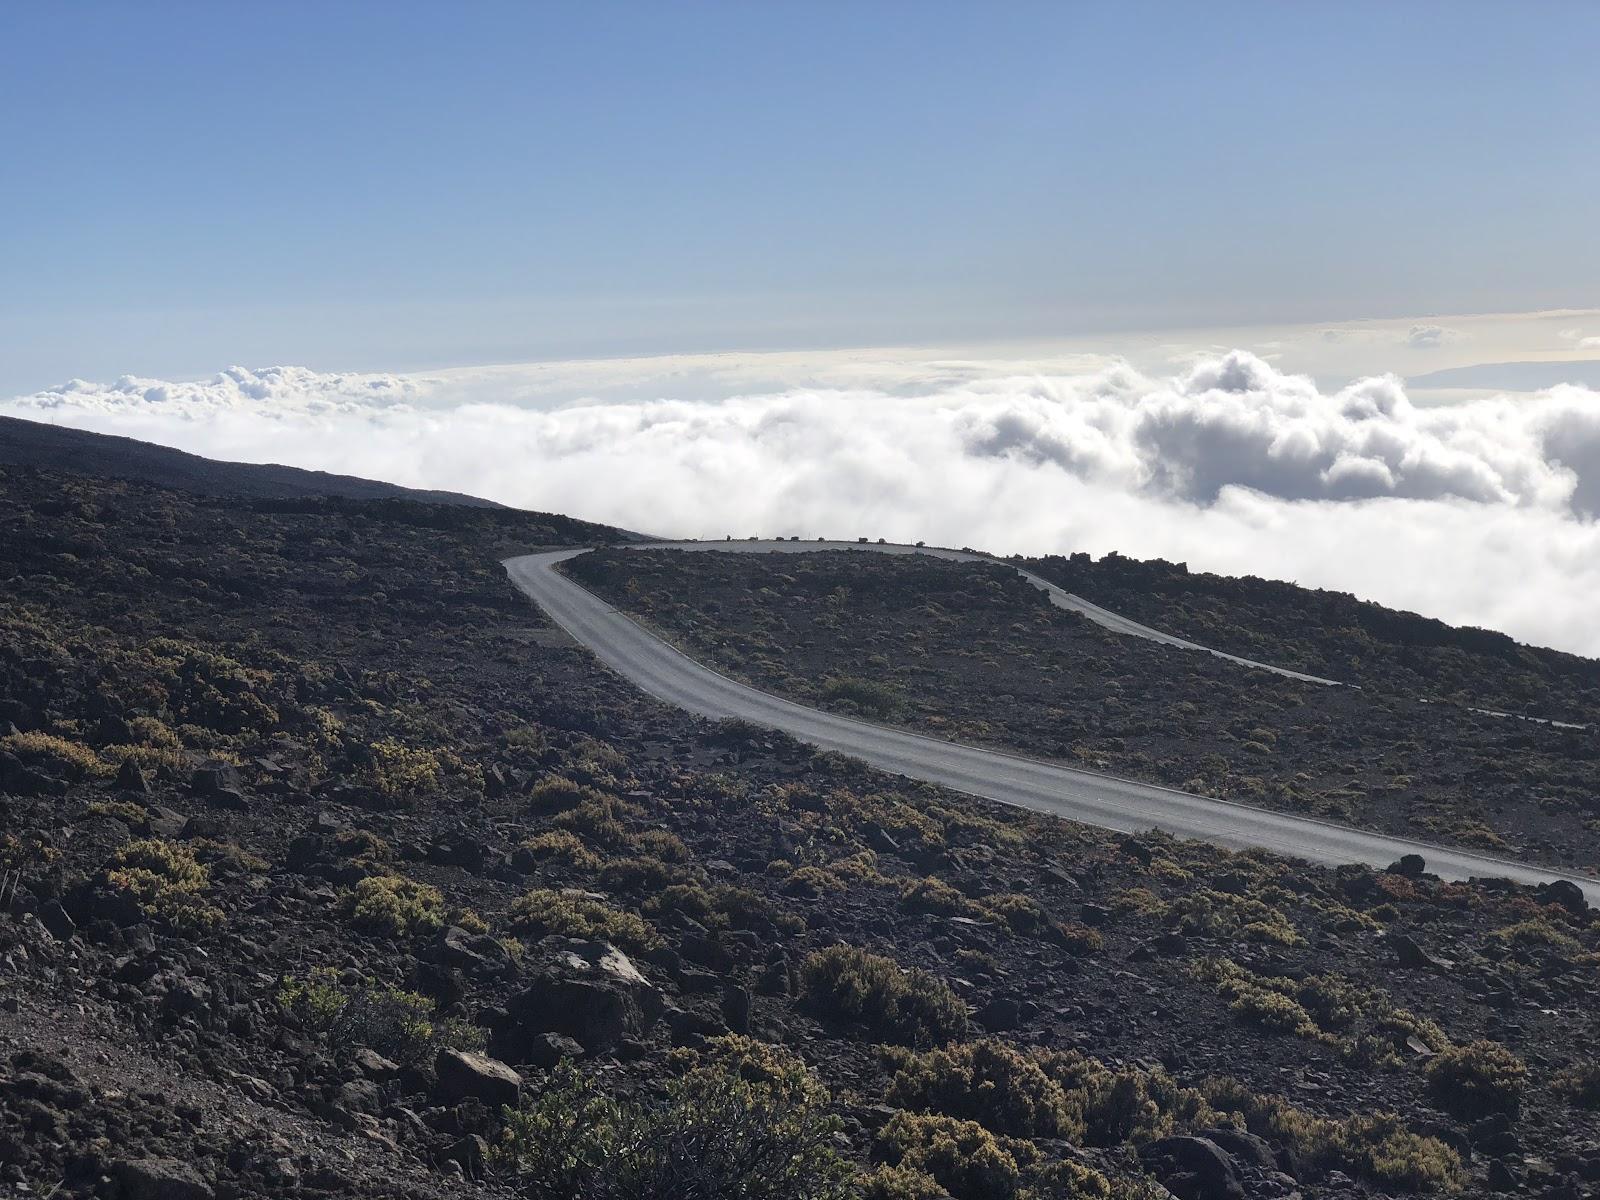 Biking Haleakala Volcano  - hairpins, volcano, sky and clouds